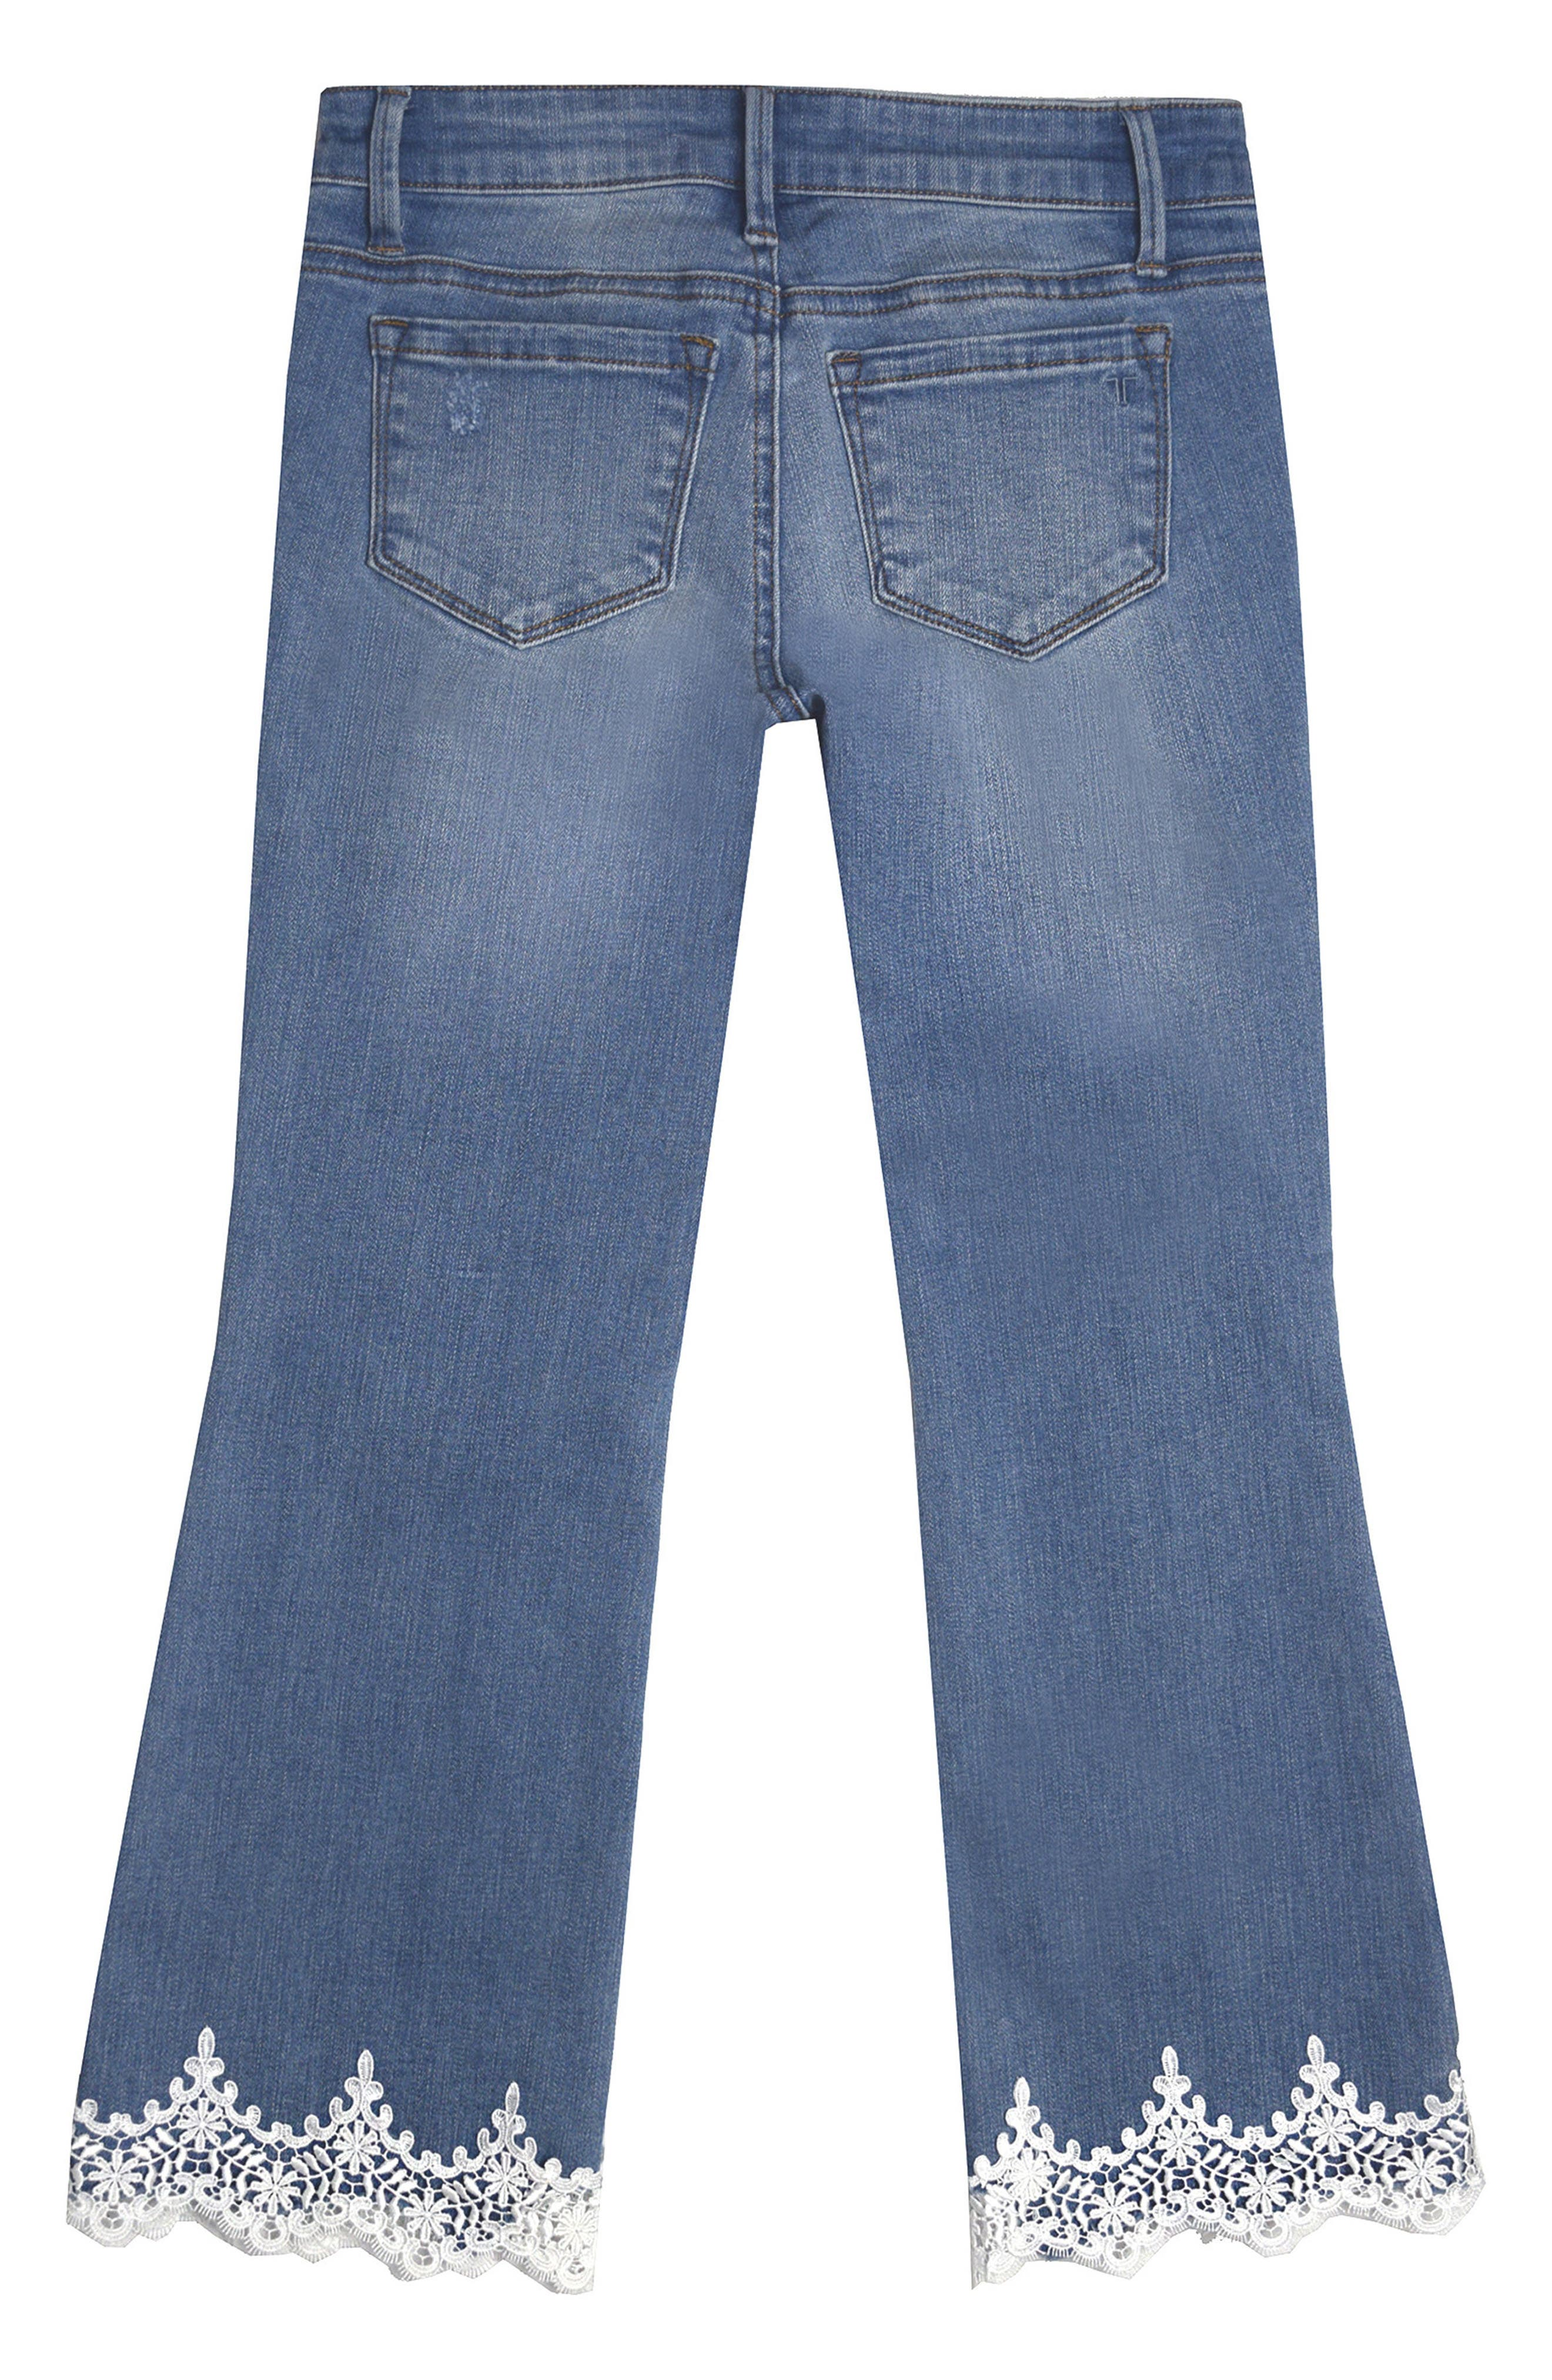 Alternate Image 2  - Tractr Lace Hem Jeans (Big Girls)